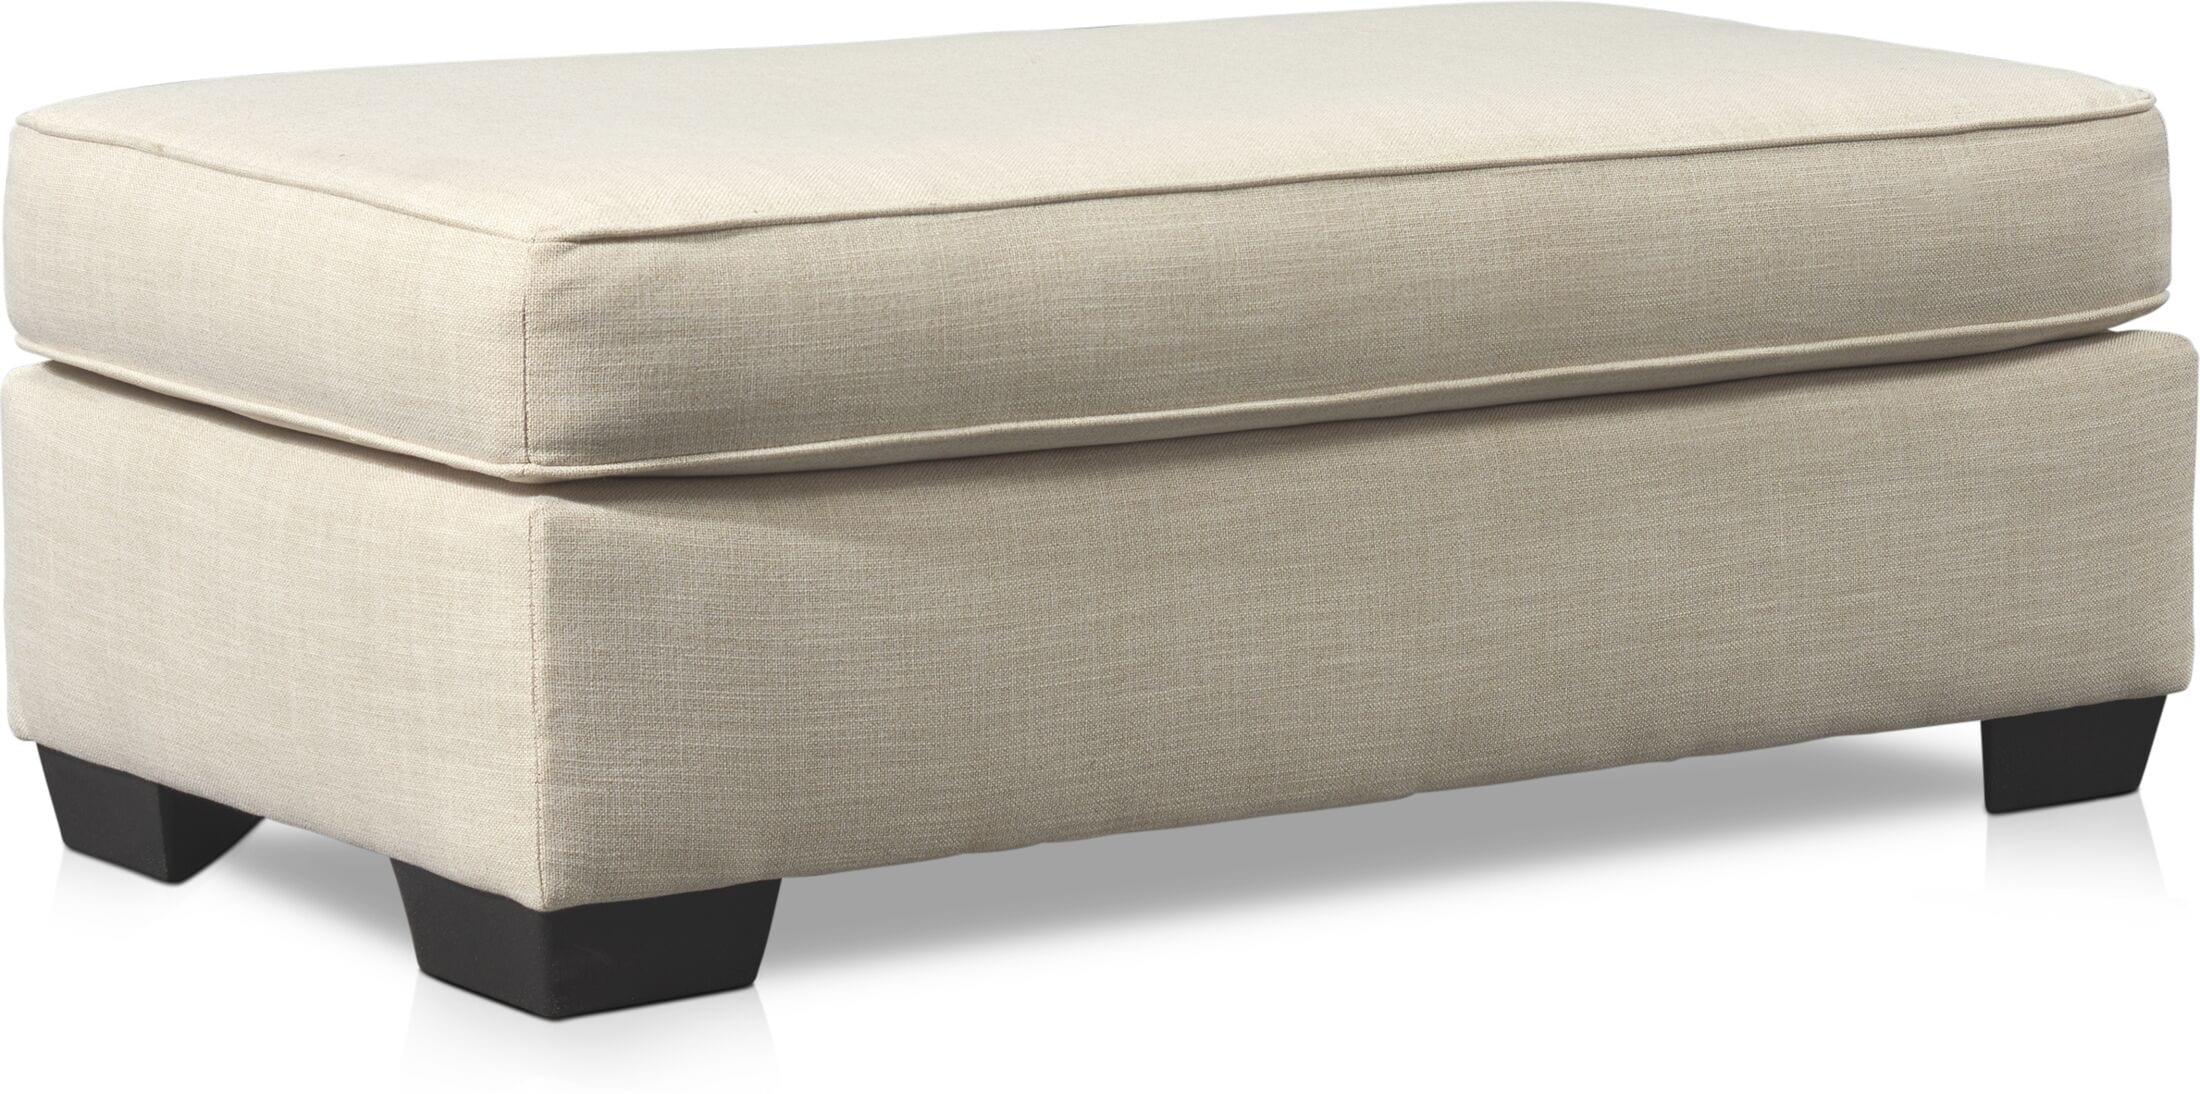 Living Room Furniture - Riley Ottoman